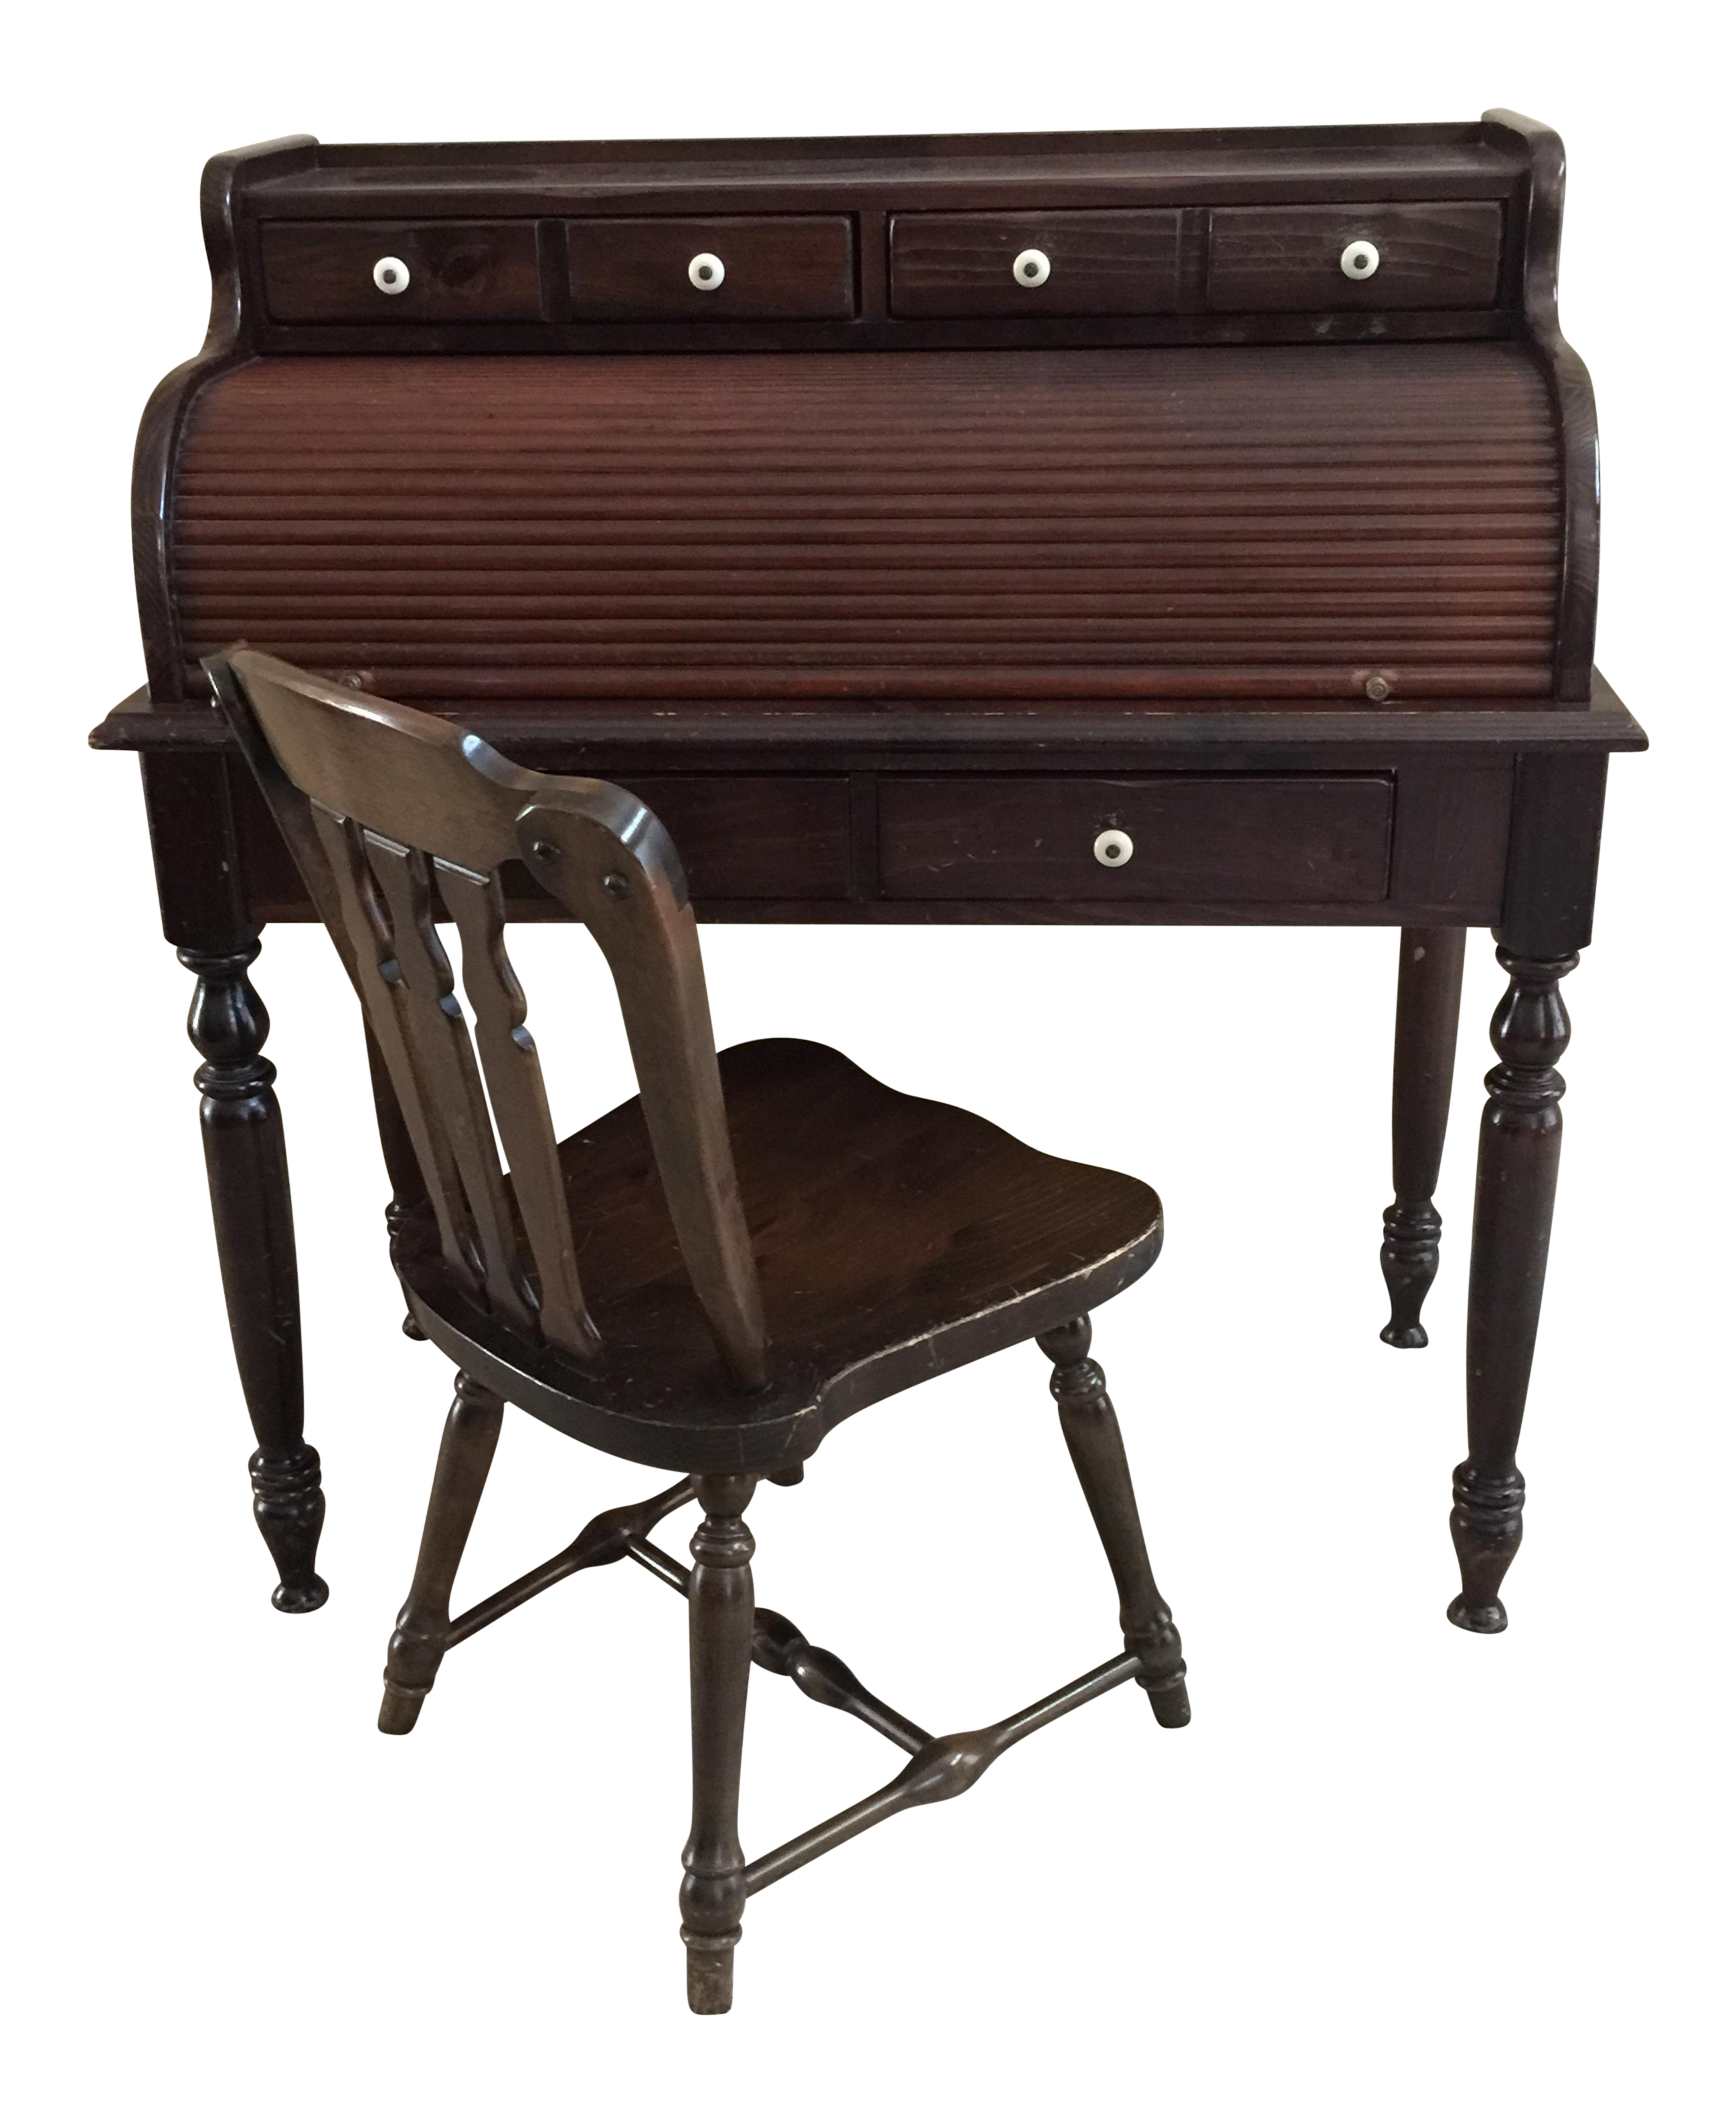 Attirant Ethan Allen Old Tavern Antiqued Pine Rolltop Desk U0026 Chair   A Pair